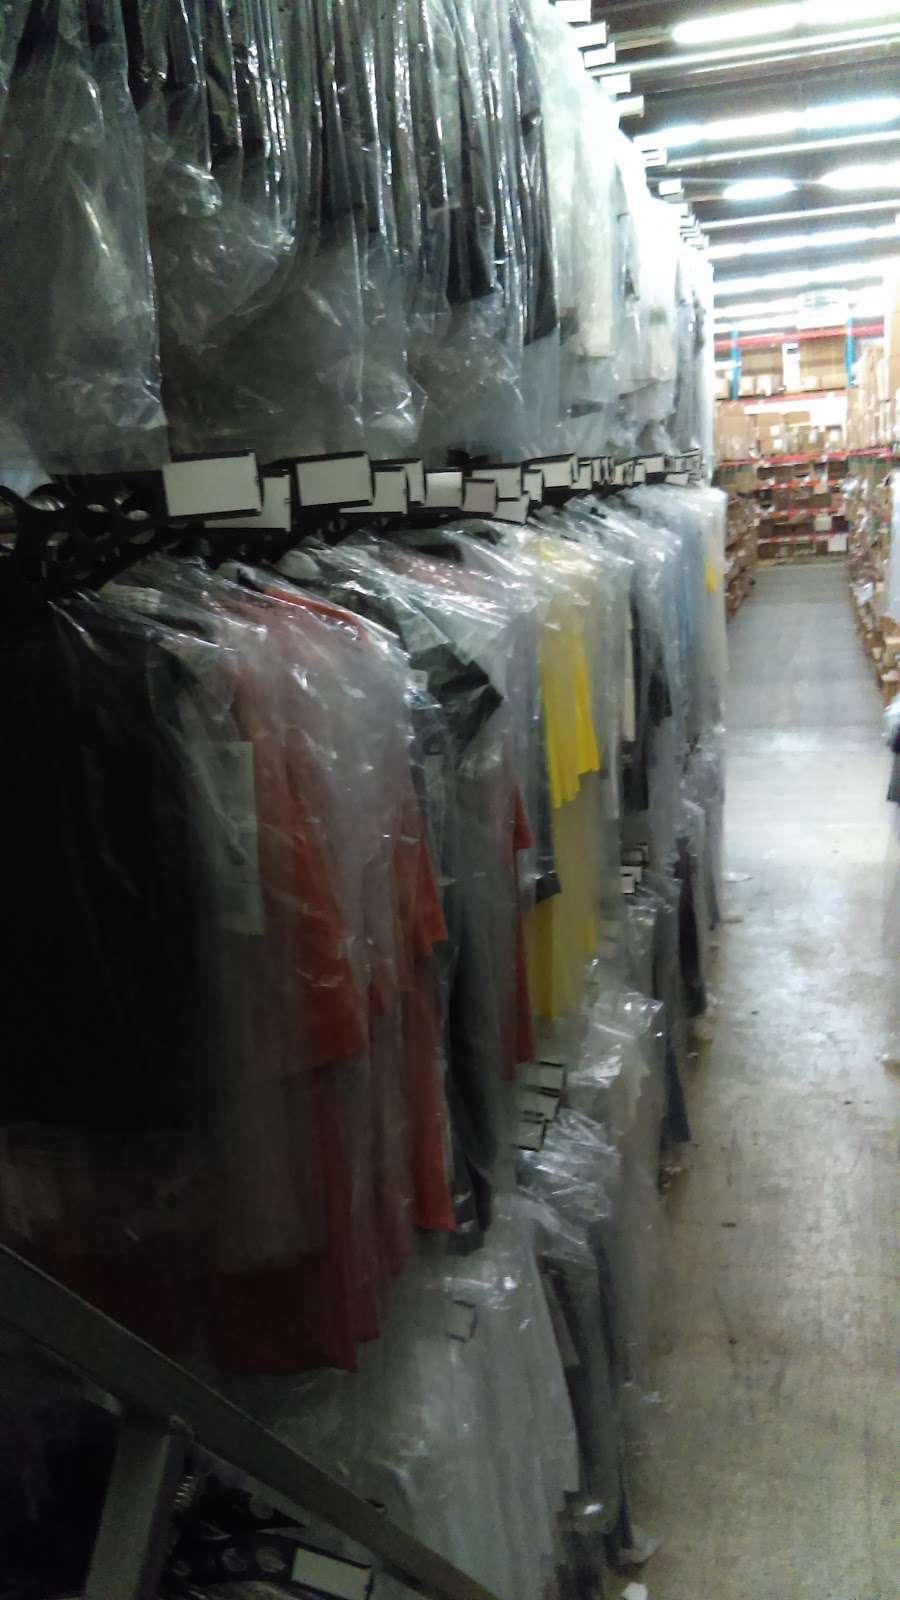 Port Logistics Group - storage    Photo 3 of 6   Address: 125 Castle Rd, Secaucus, NJ 07094, USA   Phone: (201) 865-2121